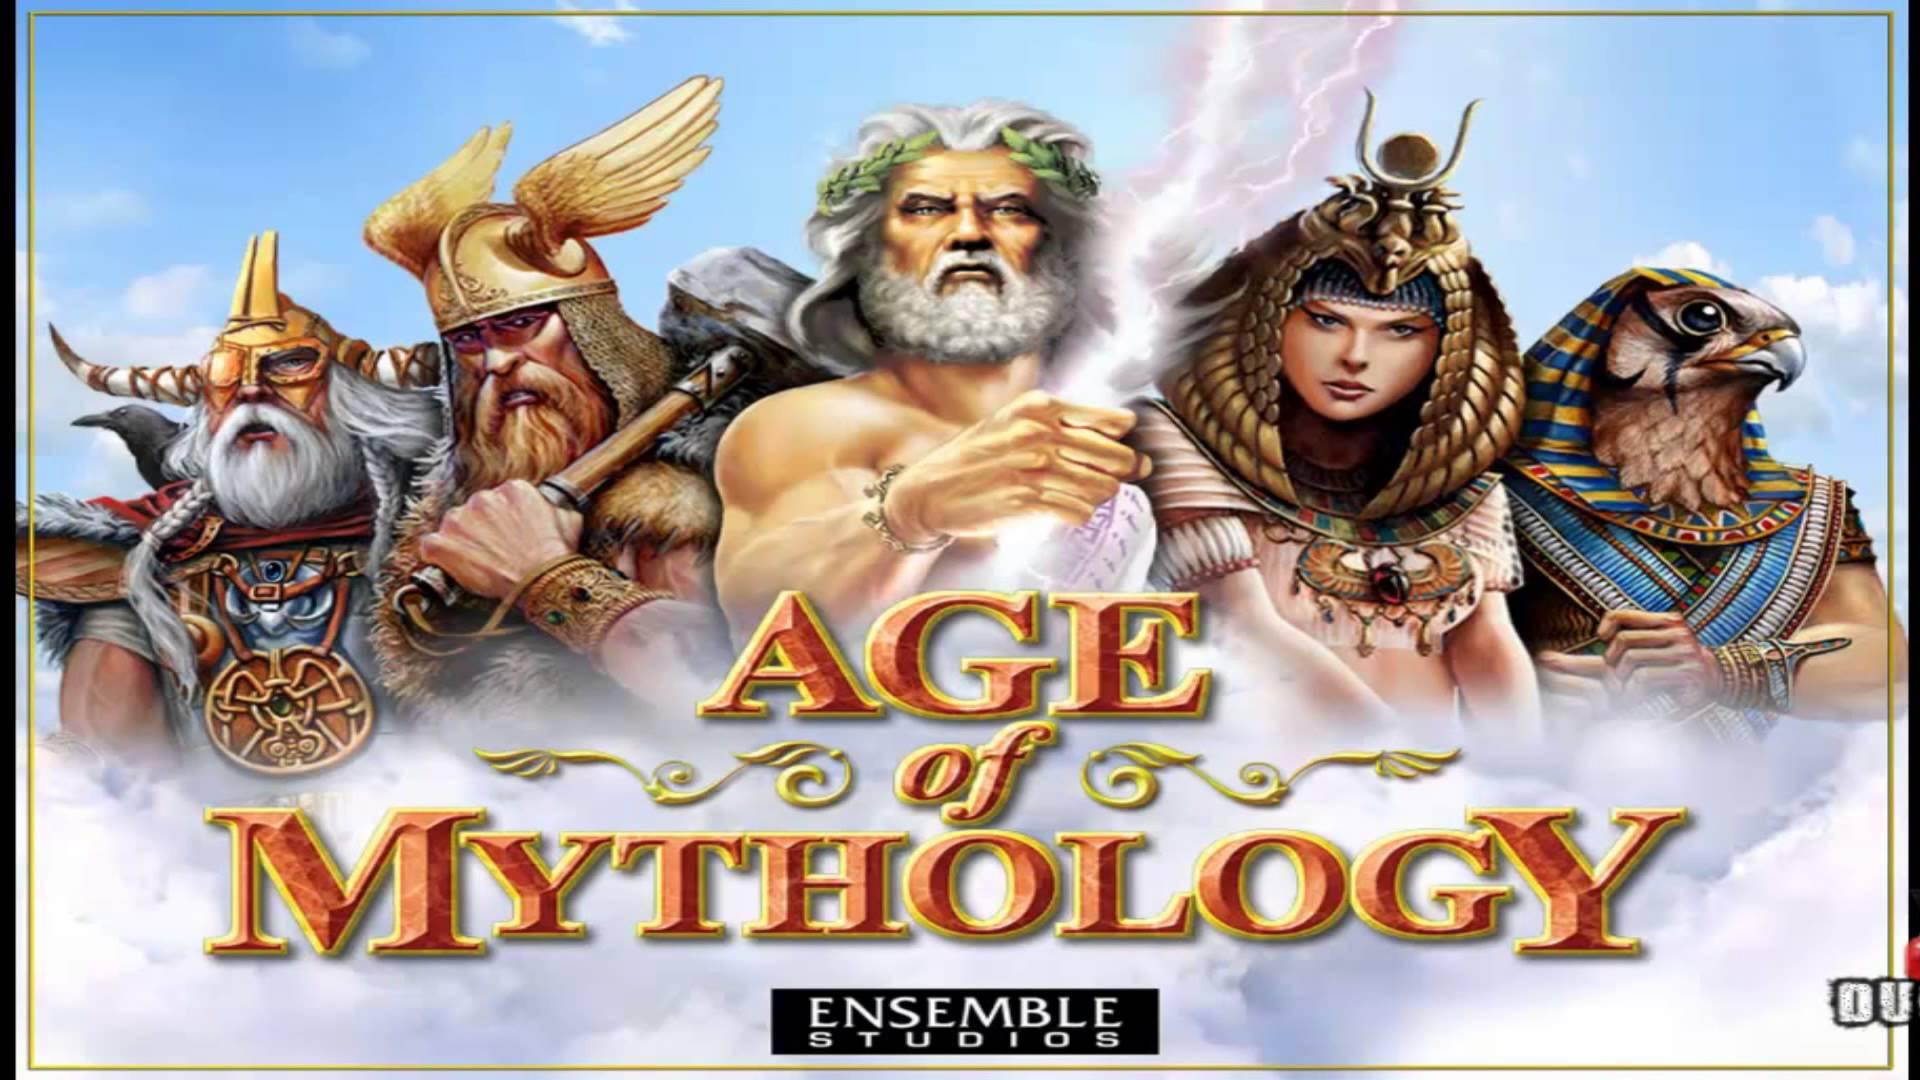 Download age of mythology free — networkice. Com.